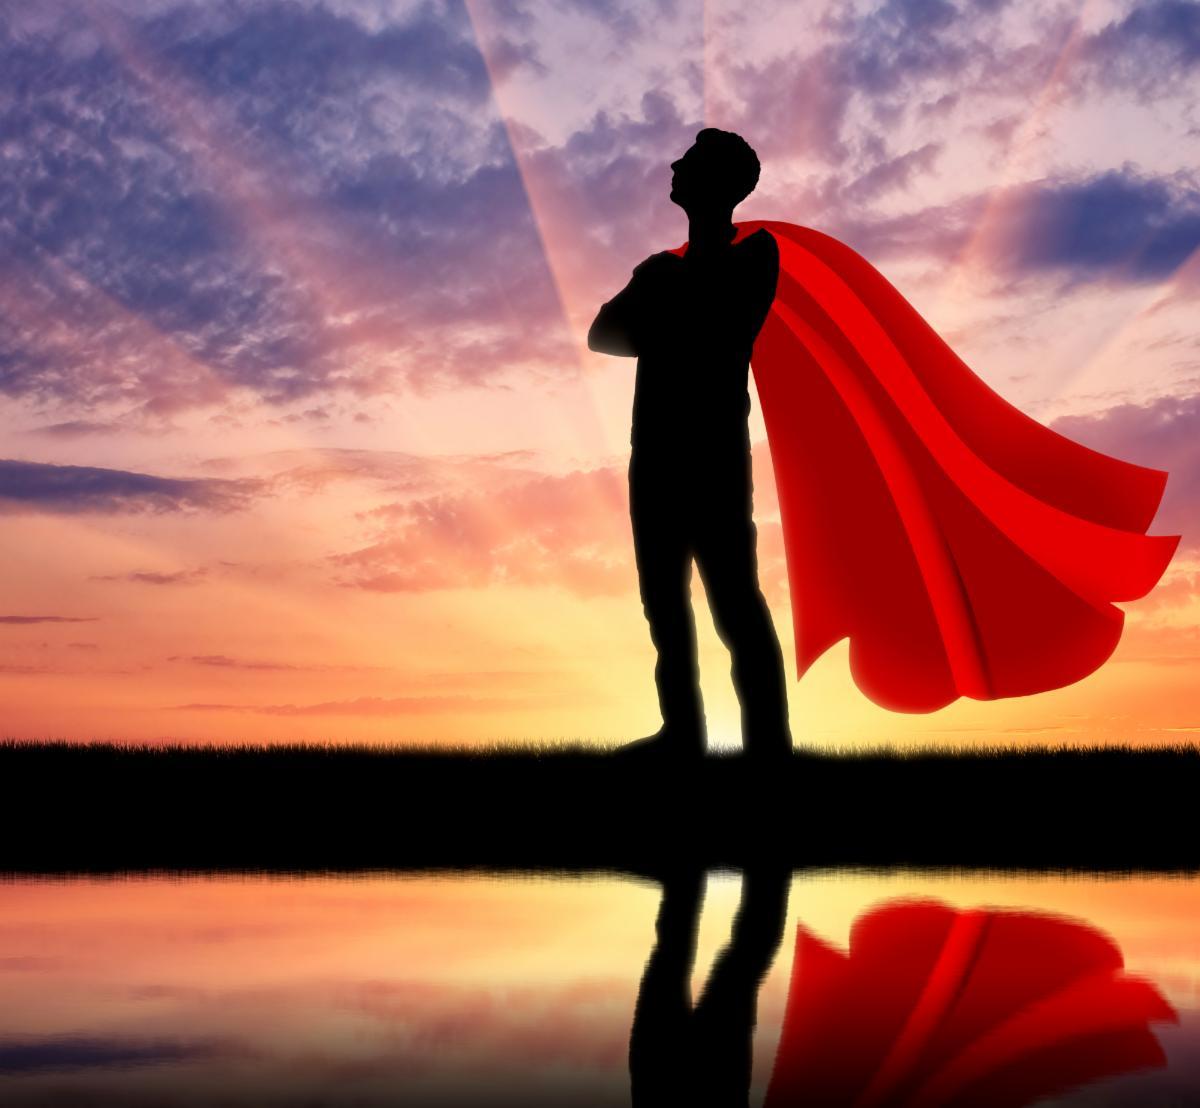 Body is Hero of the Dream